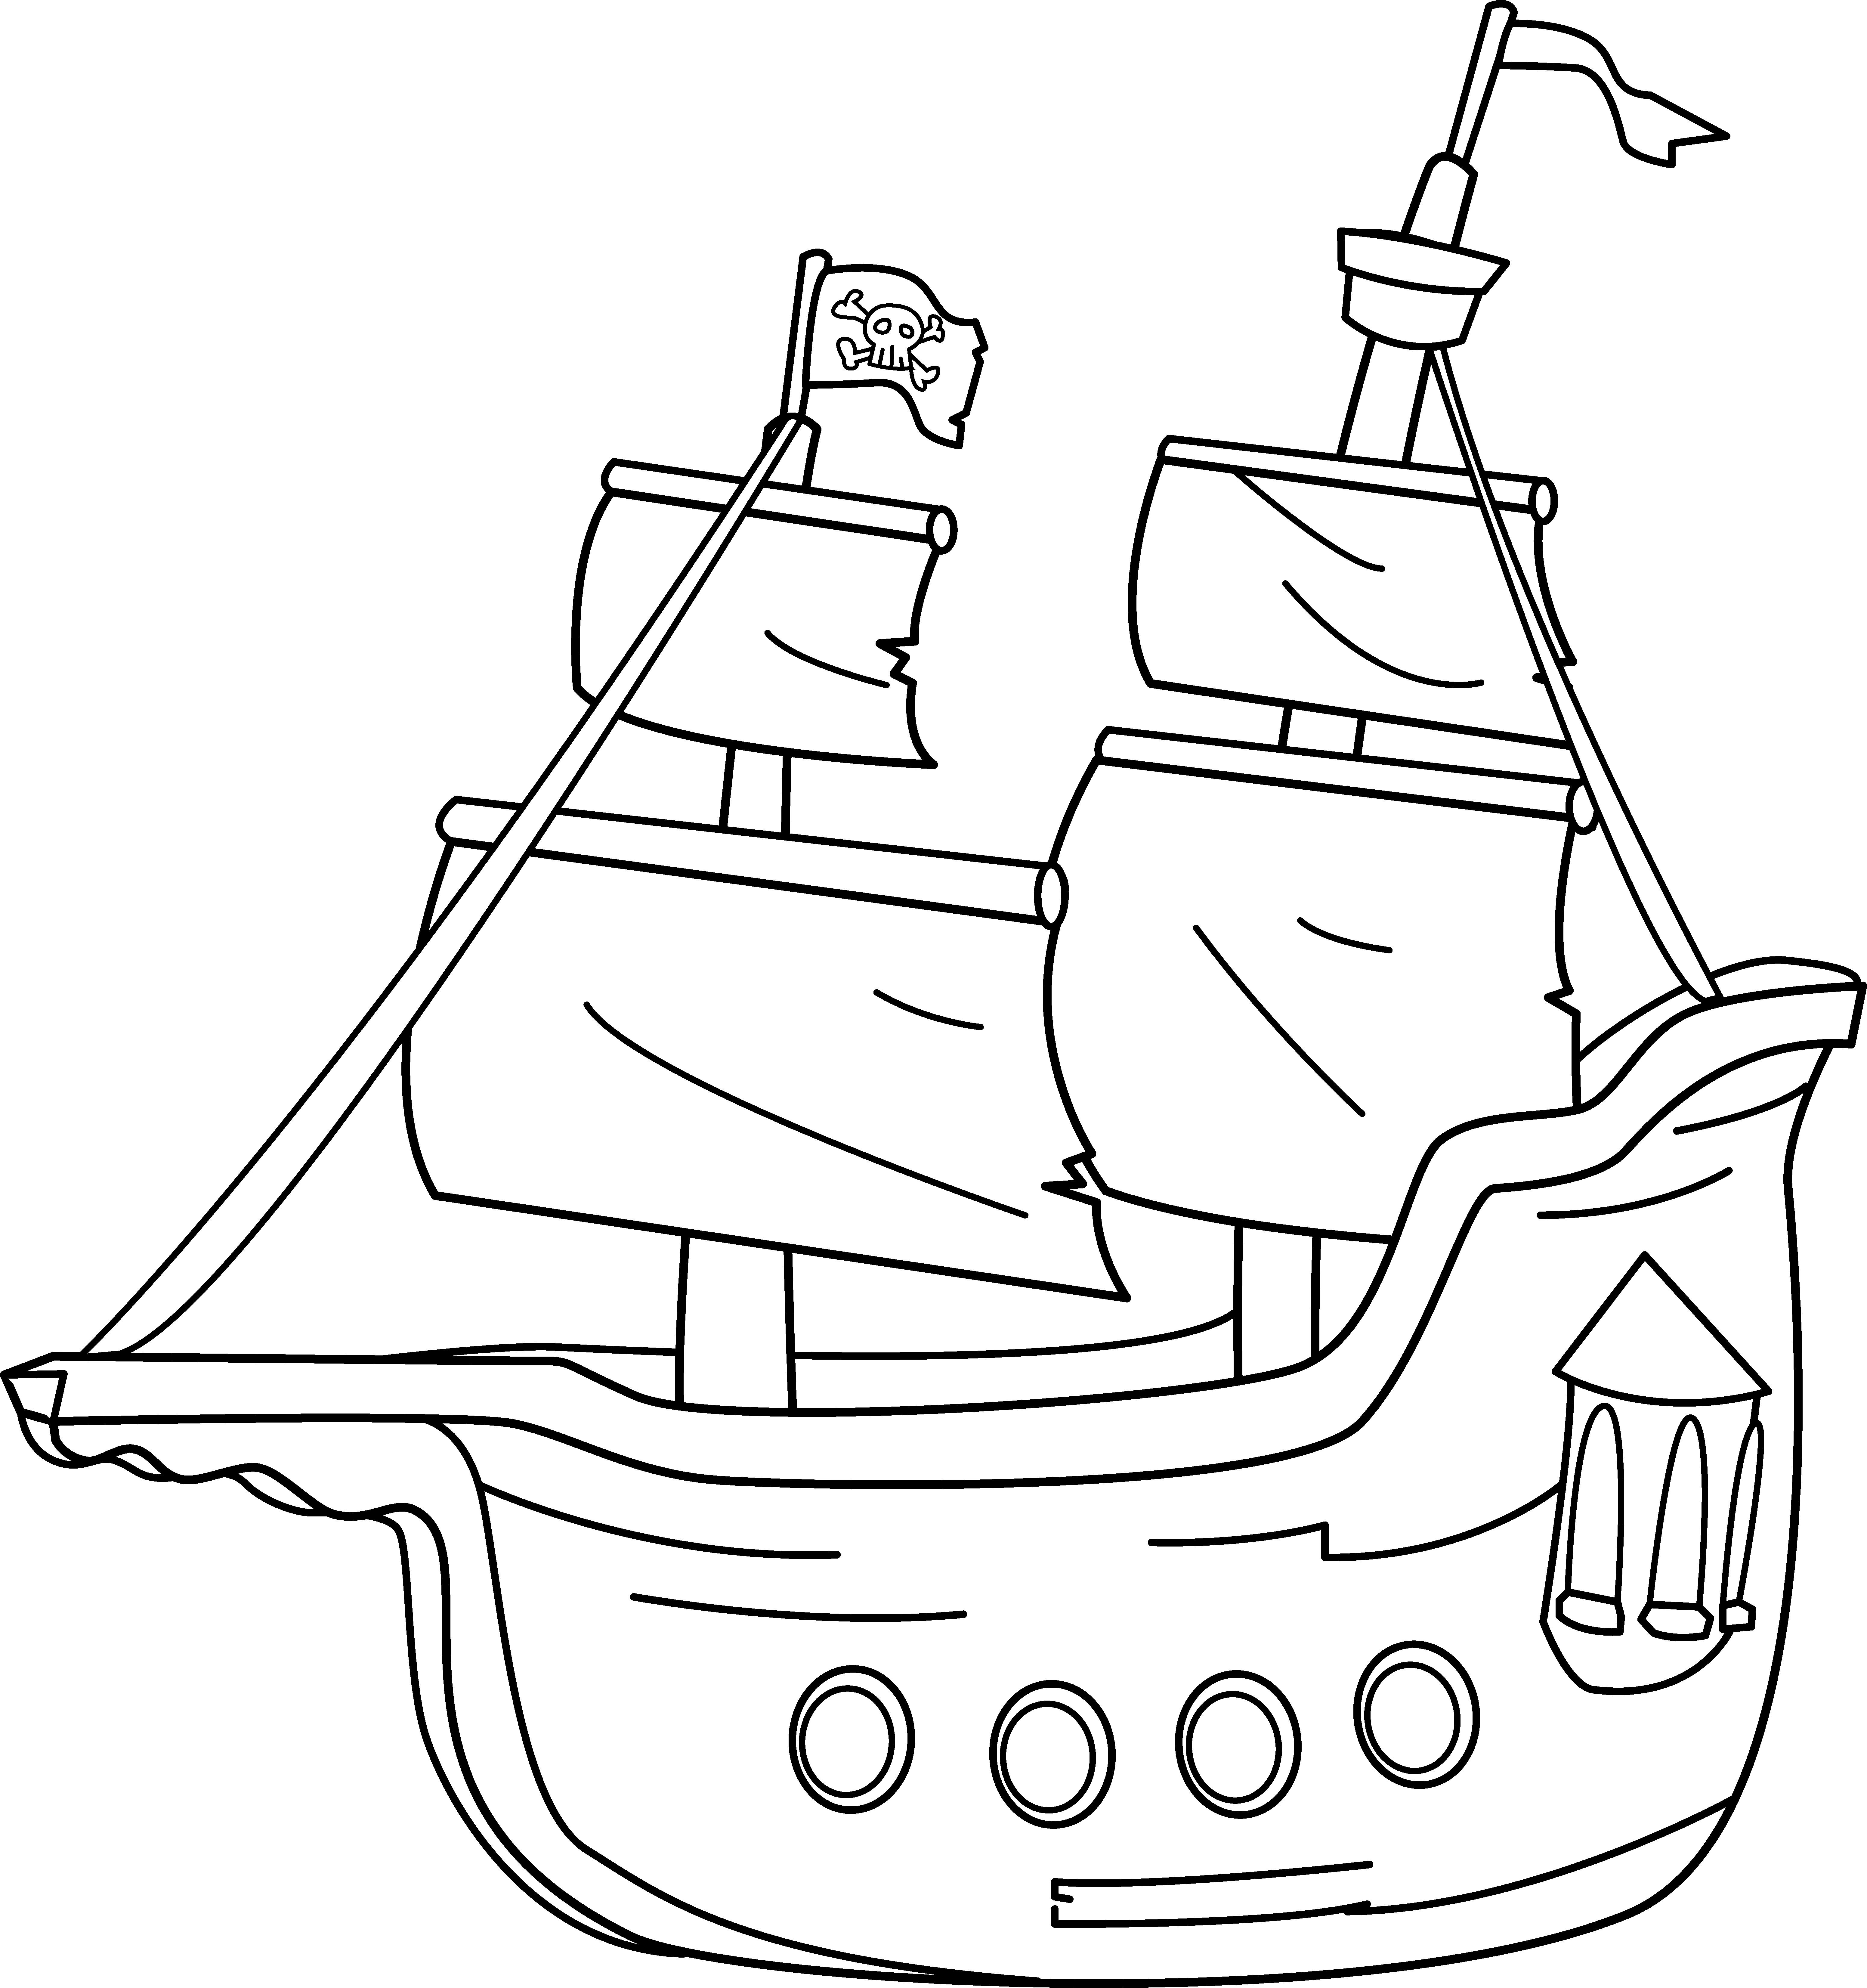 Sailing Ship clipart pirate ship Ship Coloring Free Ship Pirate